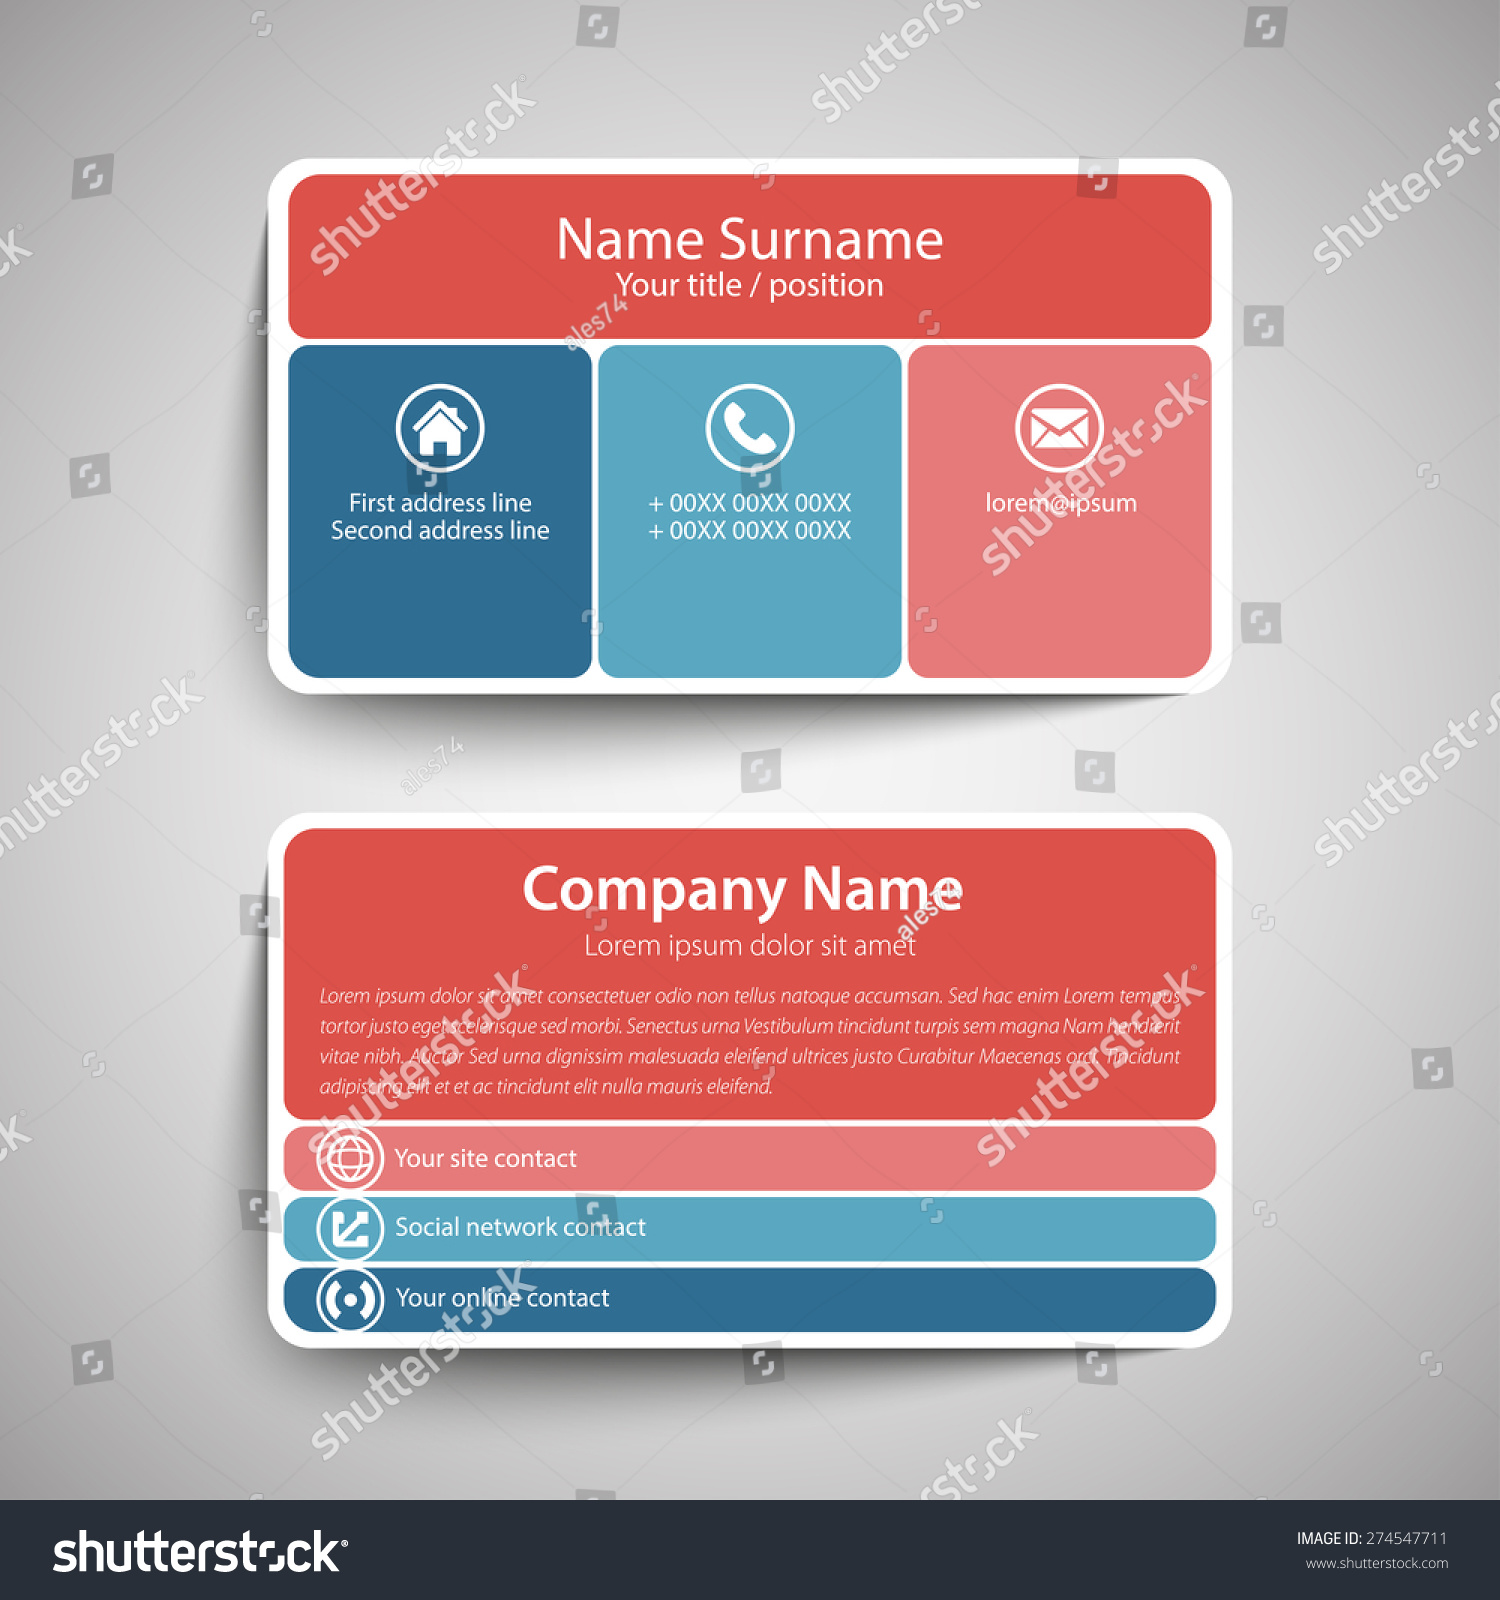 format of a business card - Roberto.mattni.co